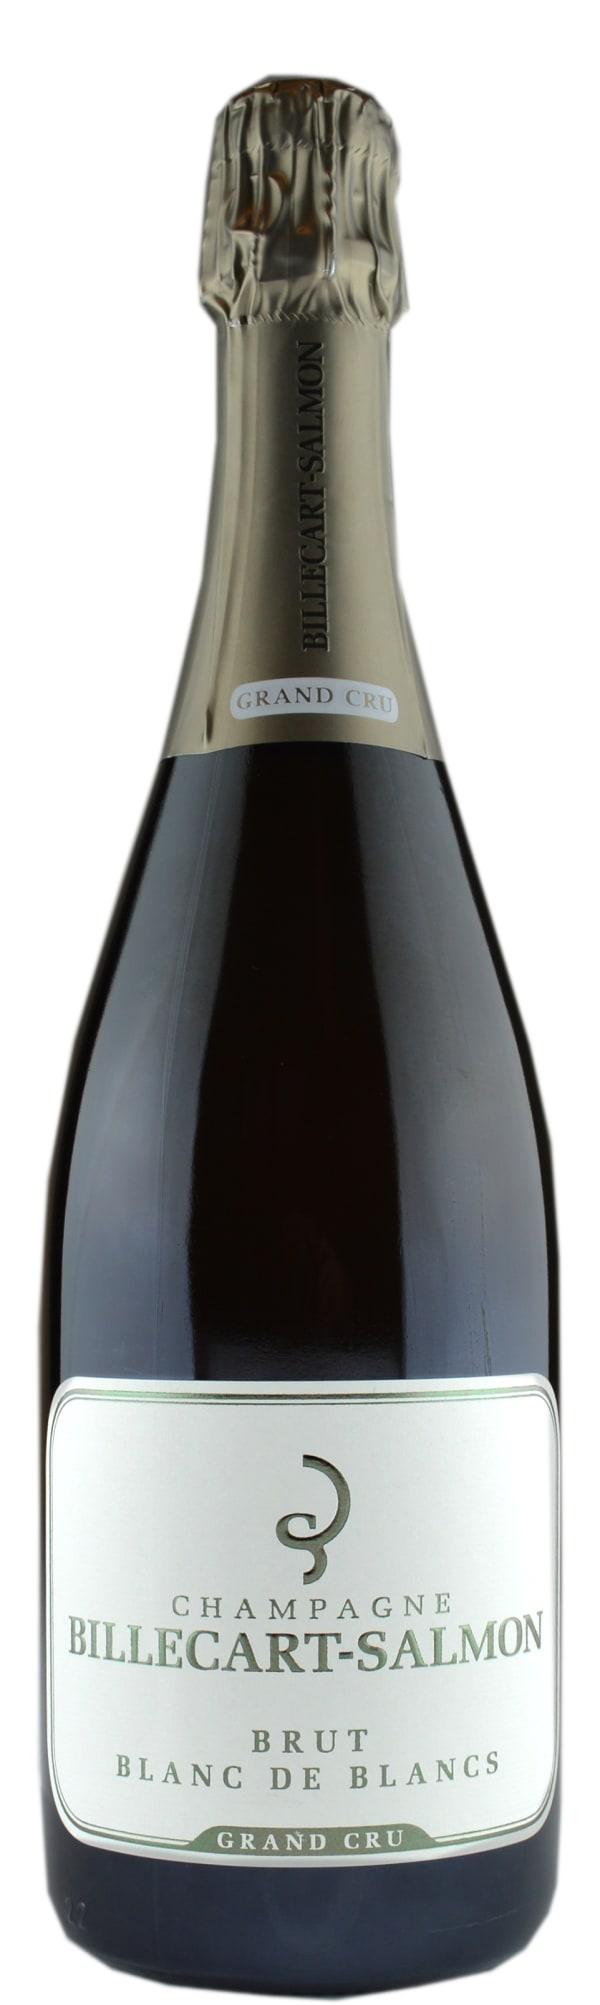 Billecart-Salmon Blanc de Blancs Grand Cru Champagne Brut